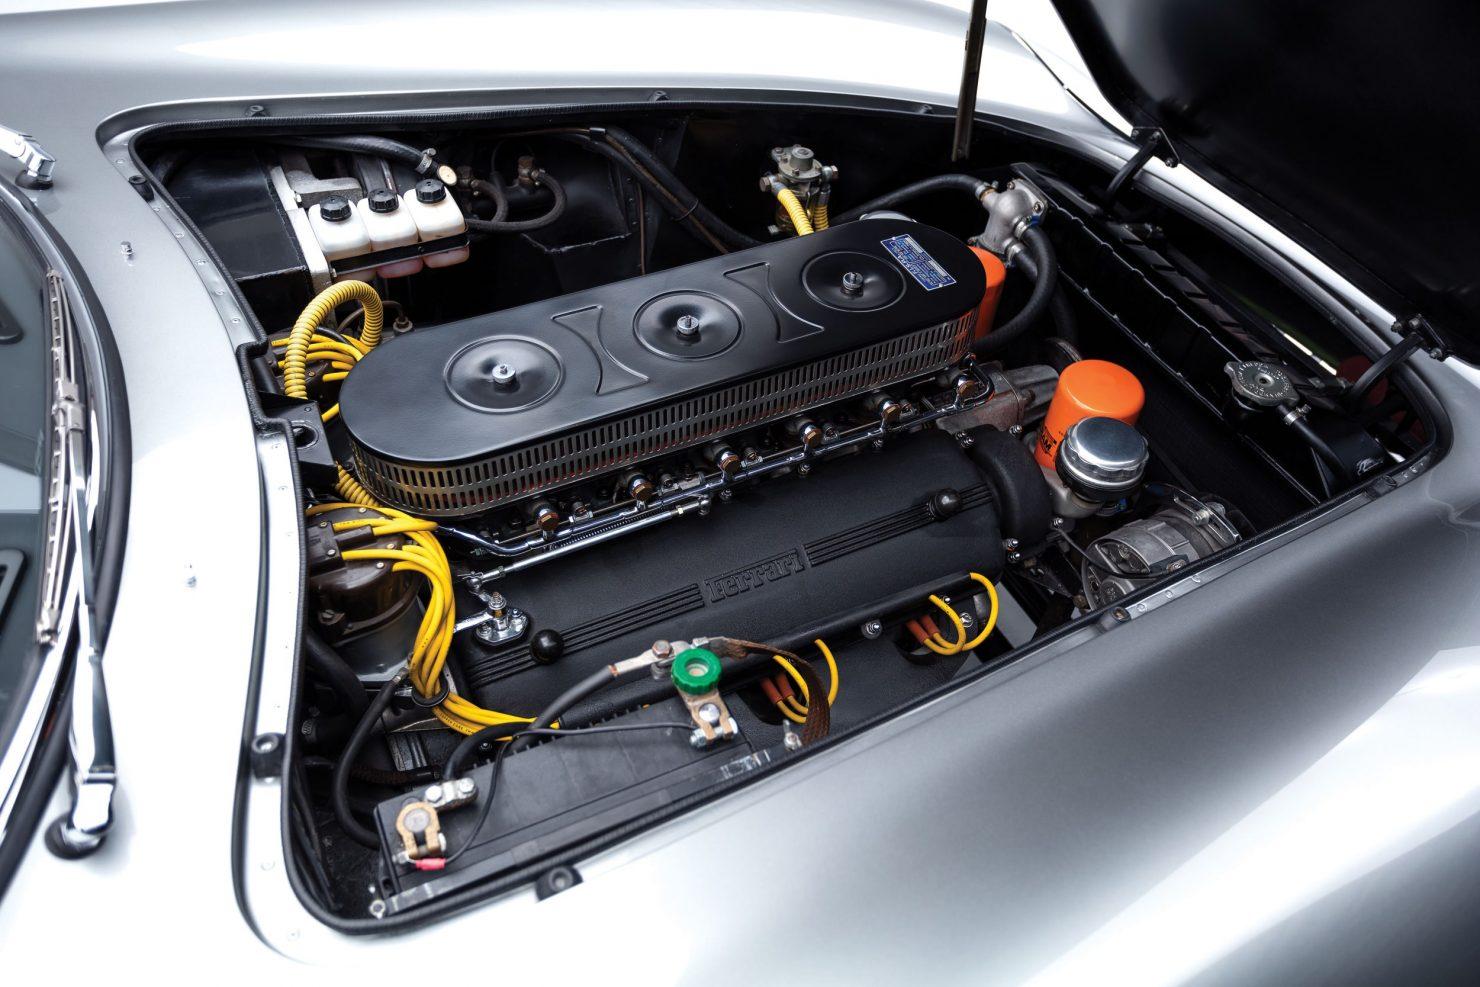 ferrari 275 gtb car 3 1480x987 - 1965 Ferrari 275 GTB/6C Alloy